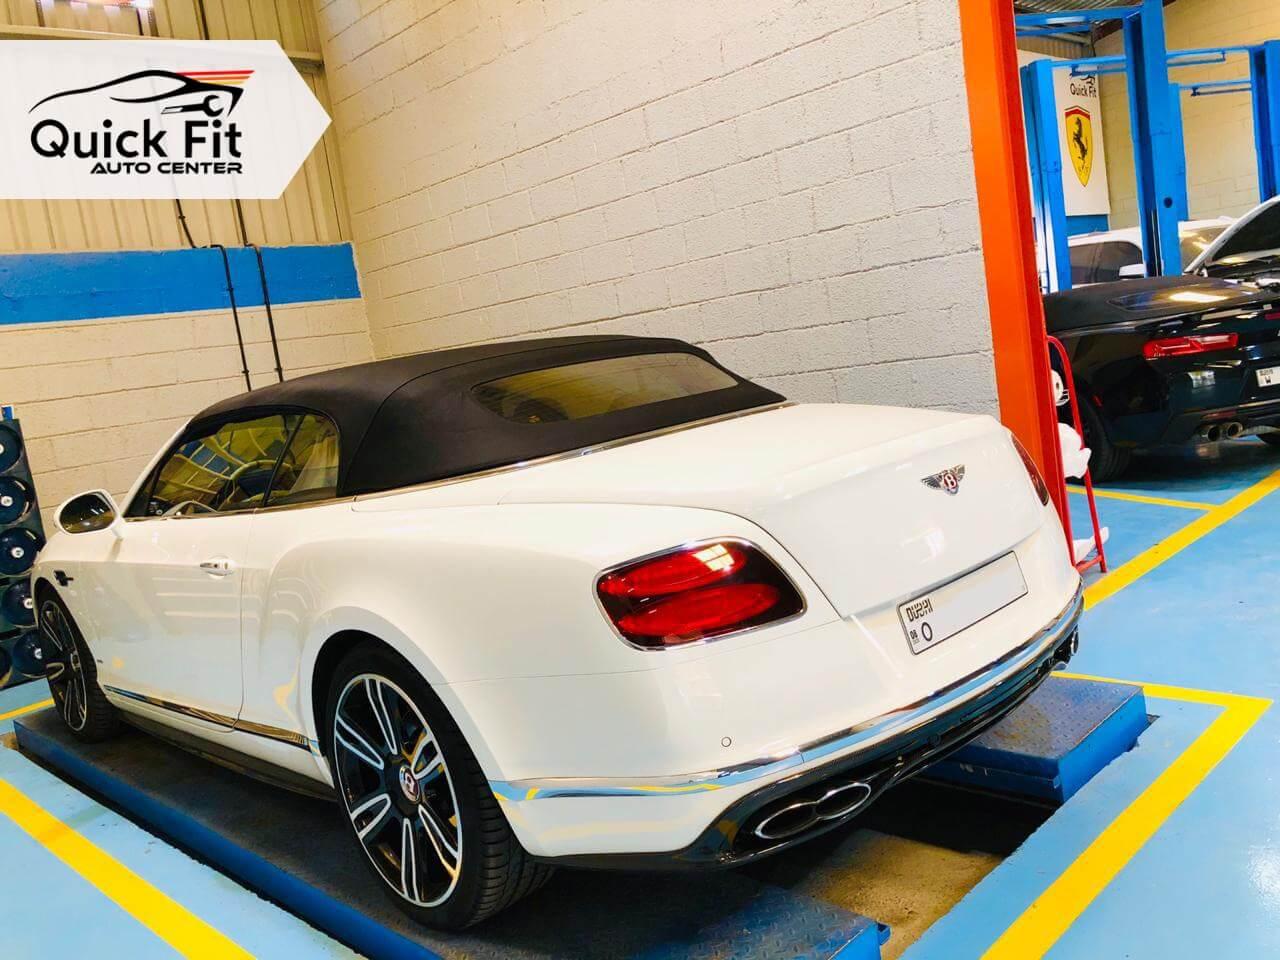 Bentley AC, Tyres and Steering Service in Dubai